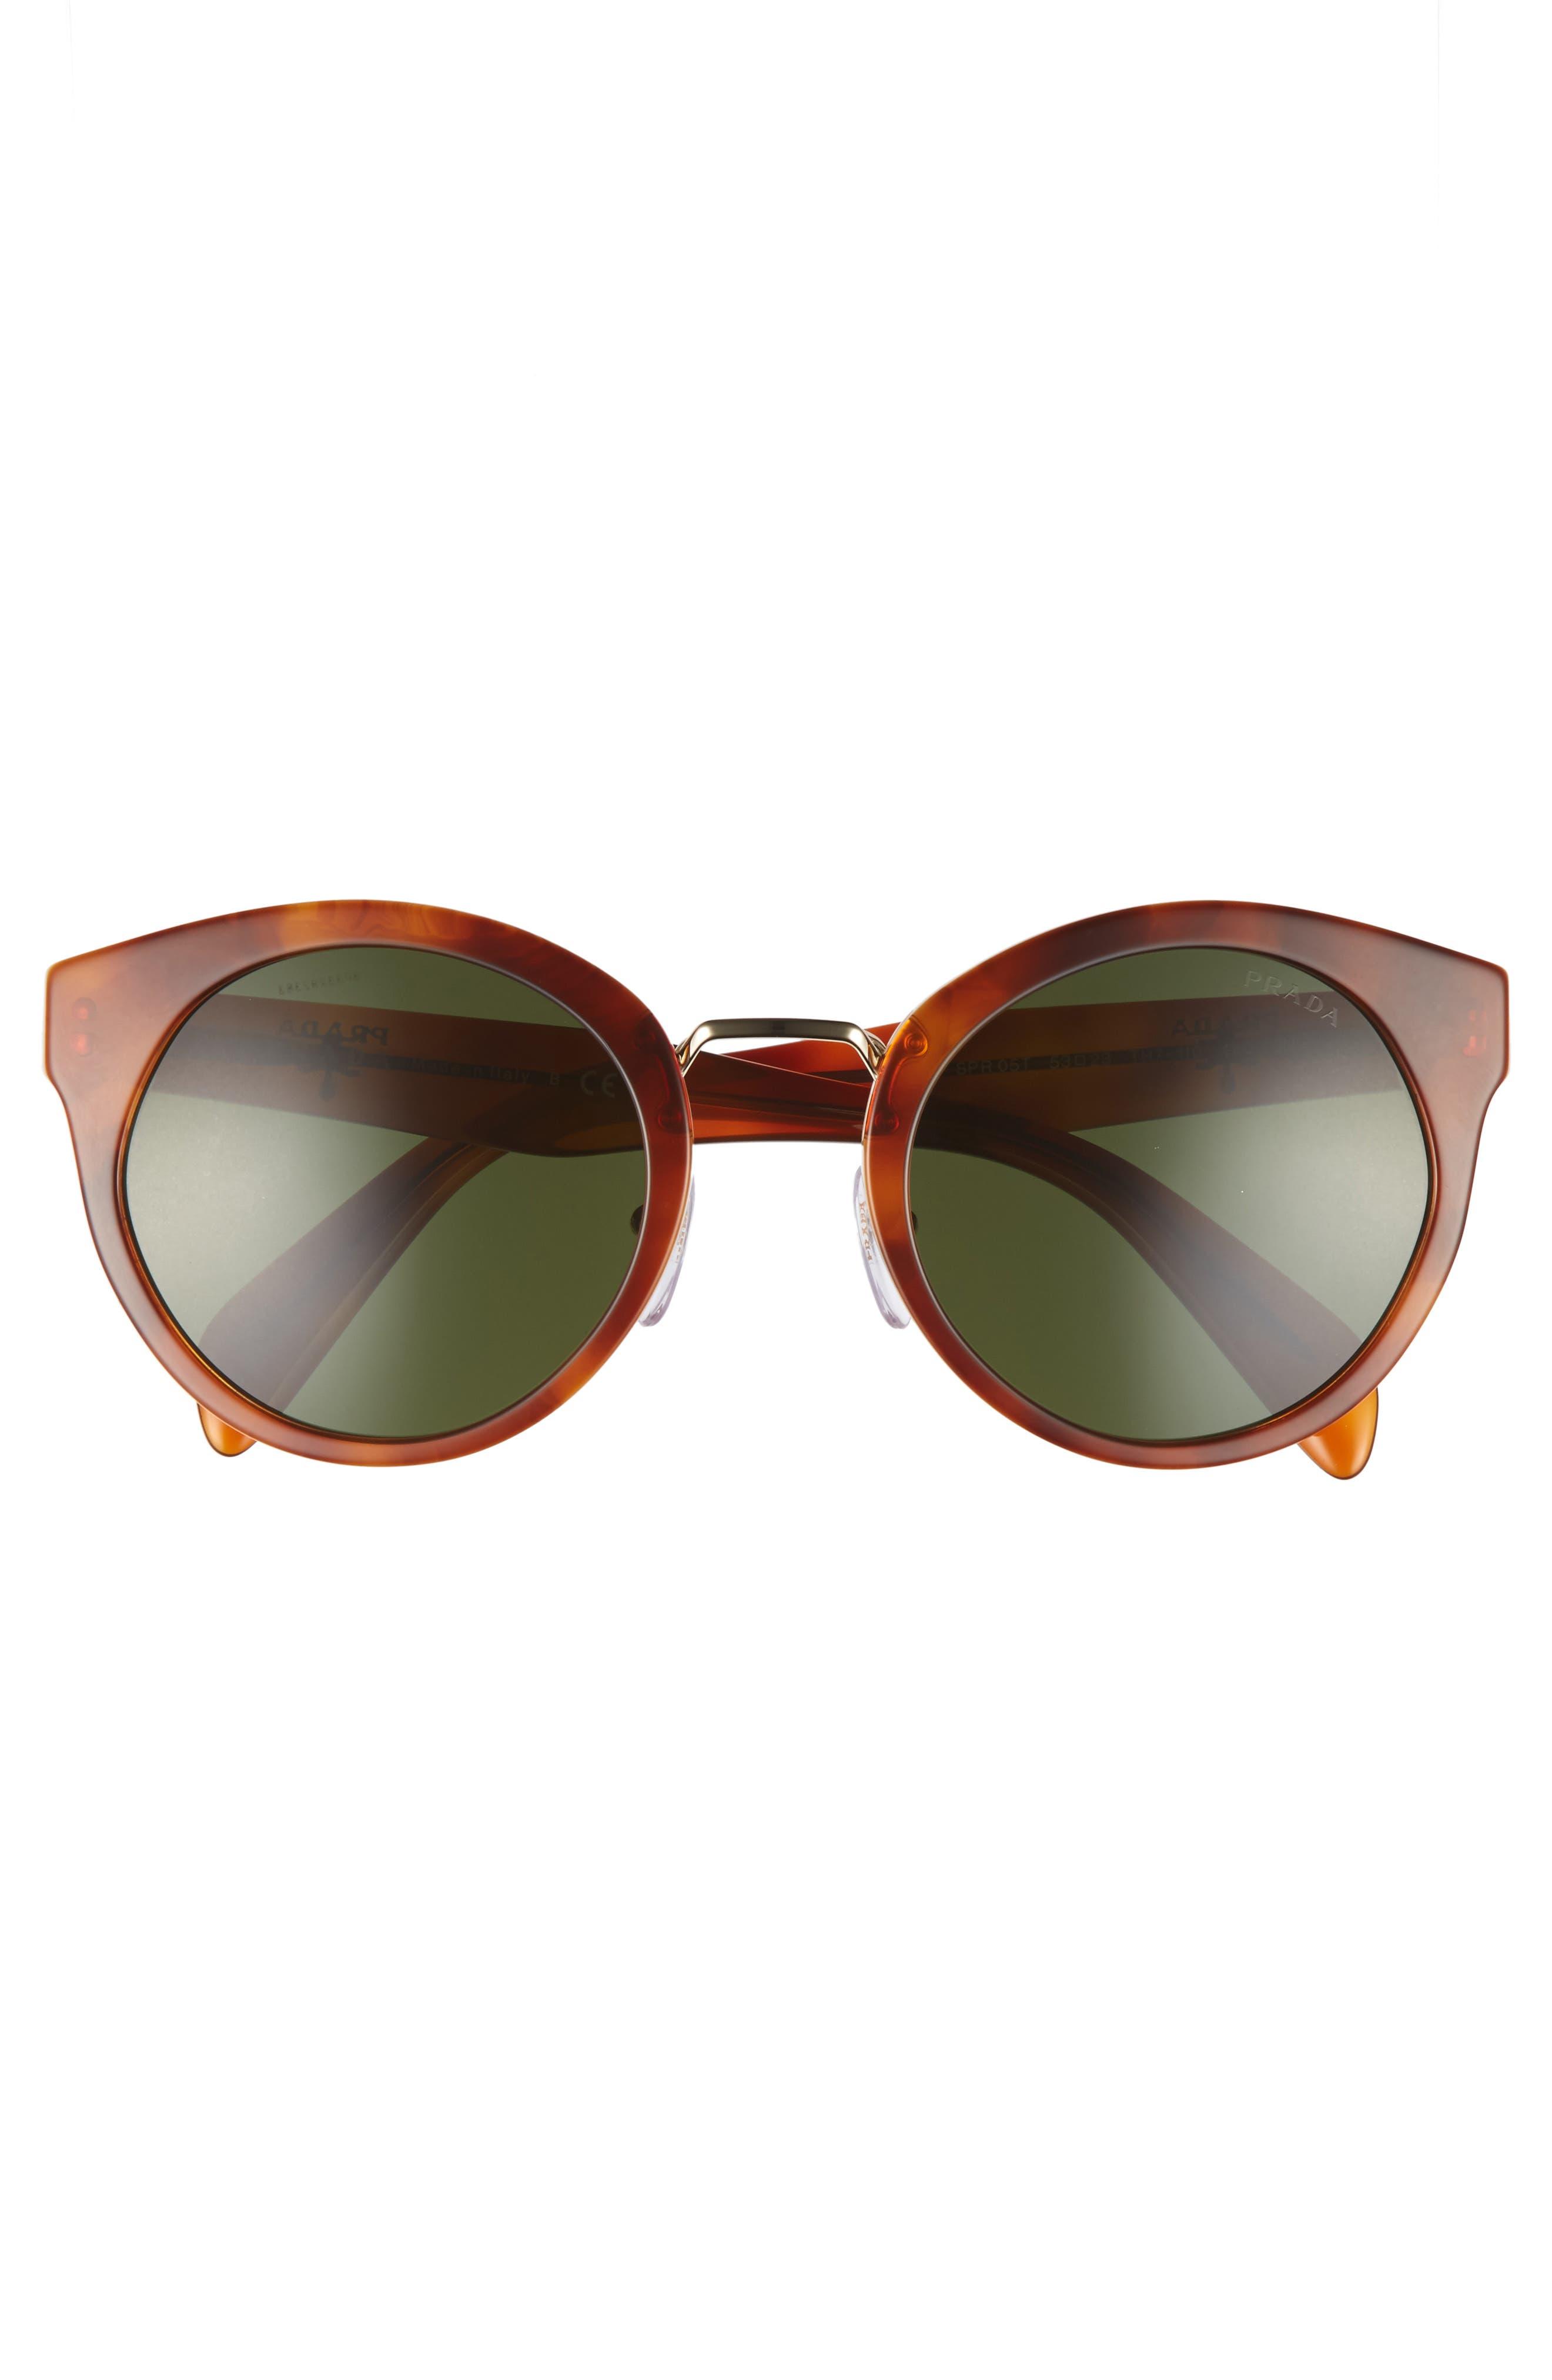 53mm Cat Eye Sunglasses,                             Alternate thumbnail 3, color,                             200